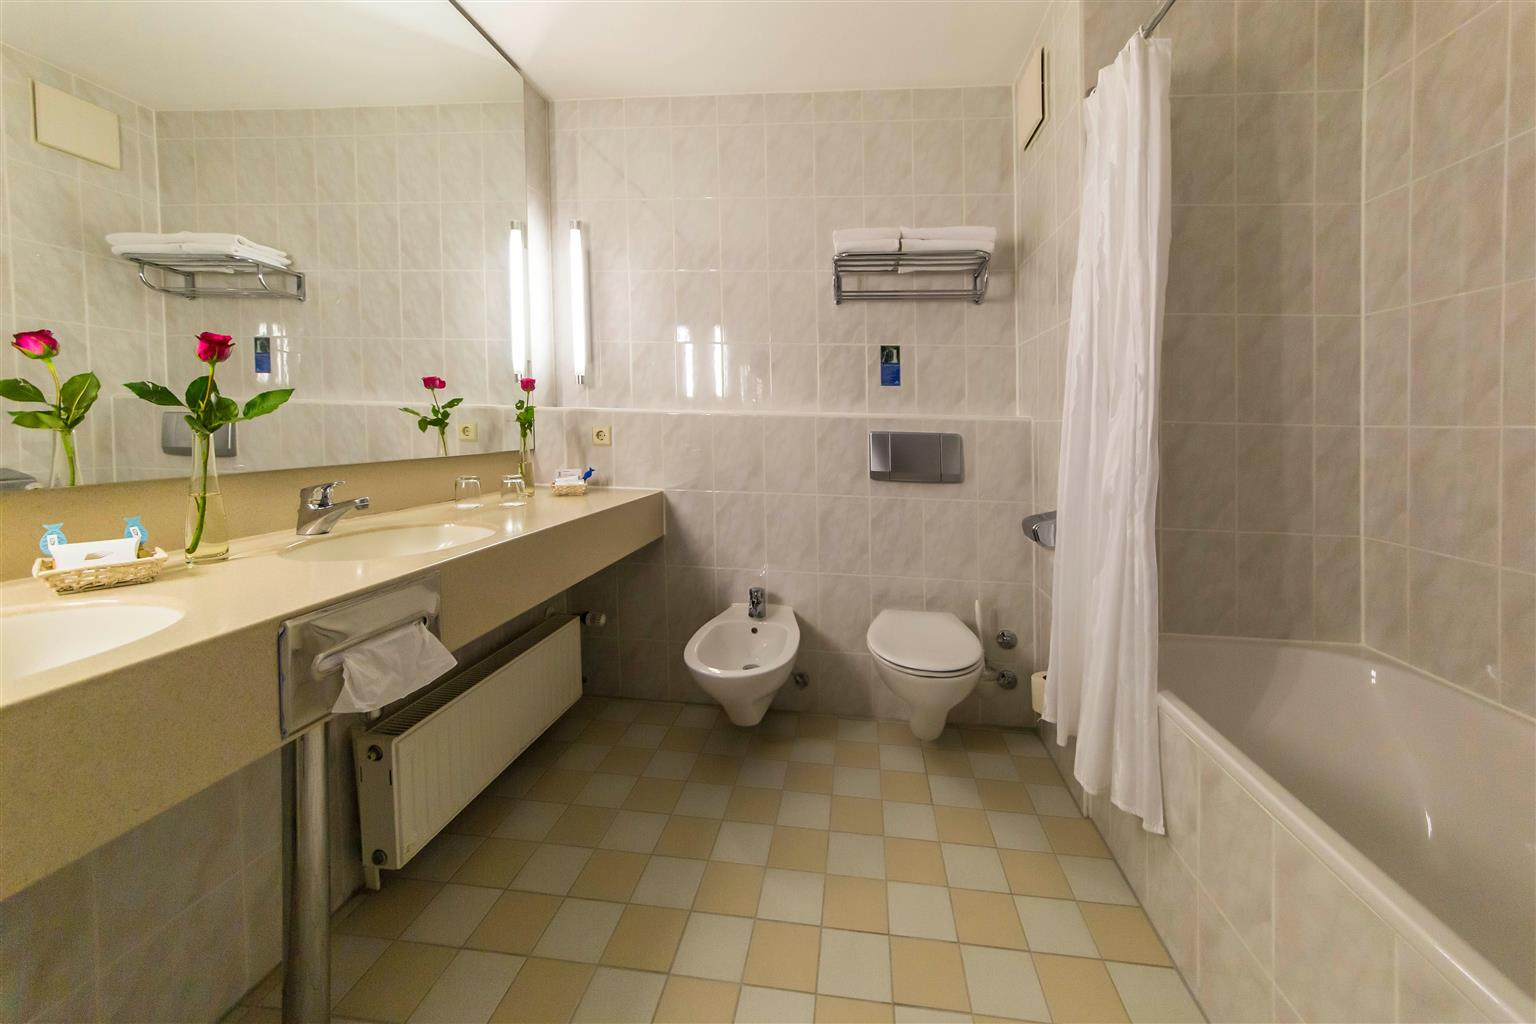 best western hotel polisina - Ochsenfurt Hotel